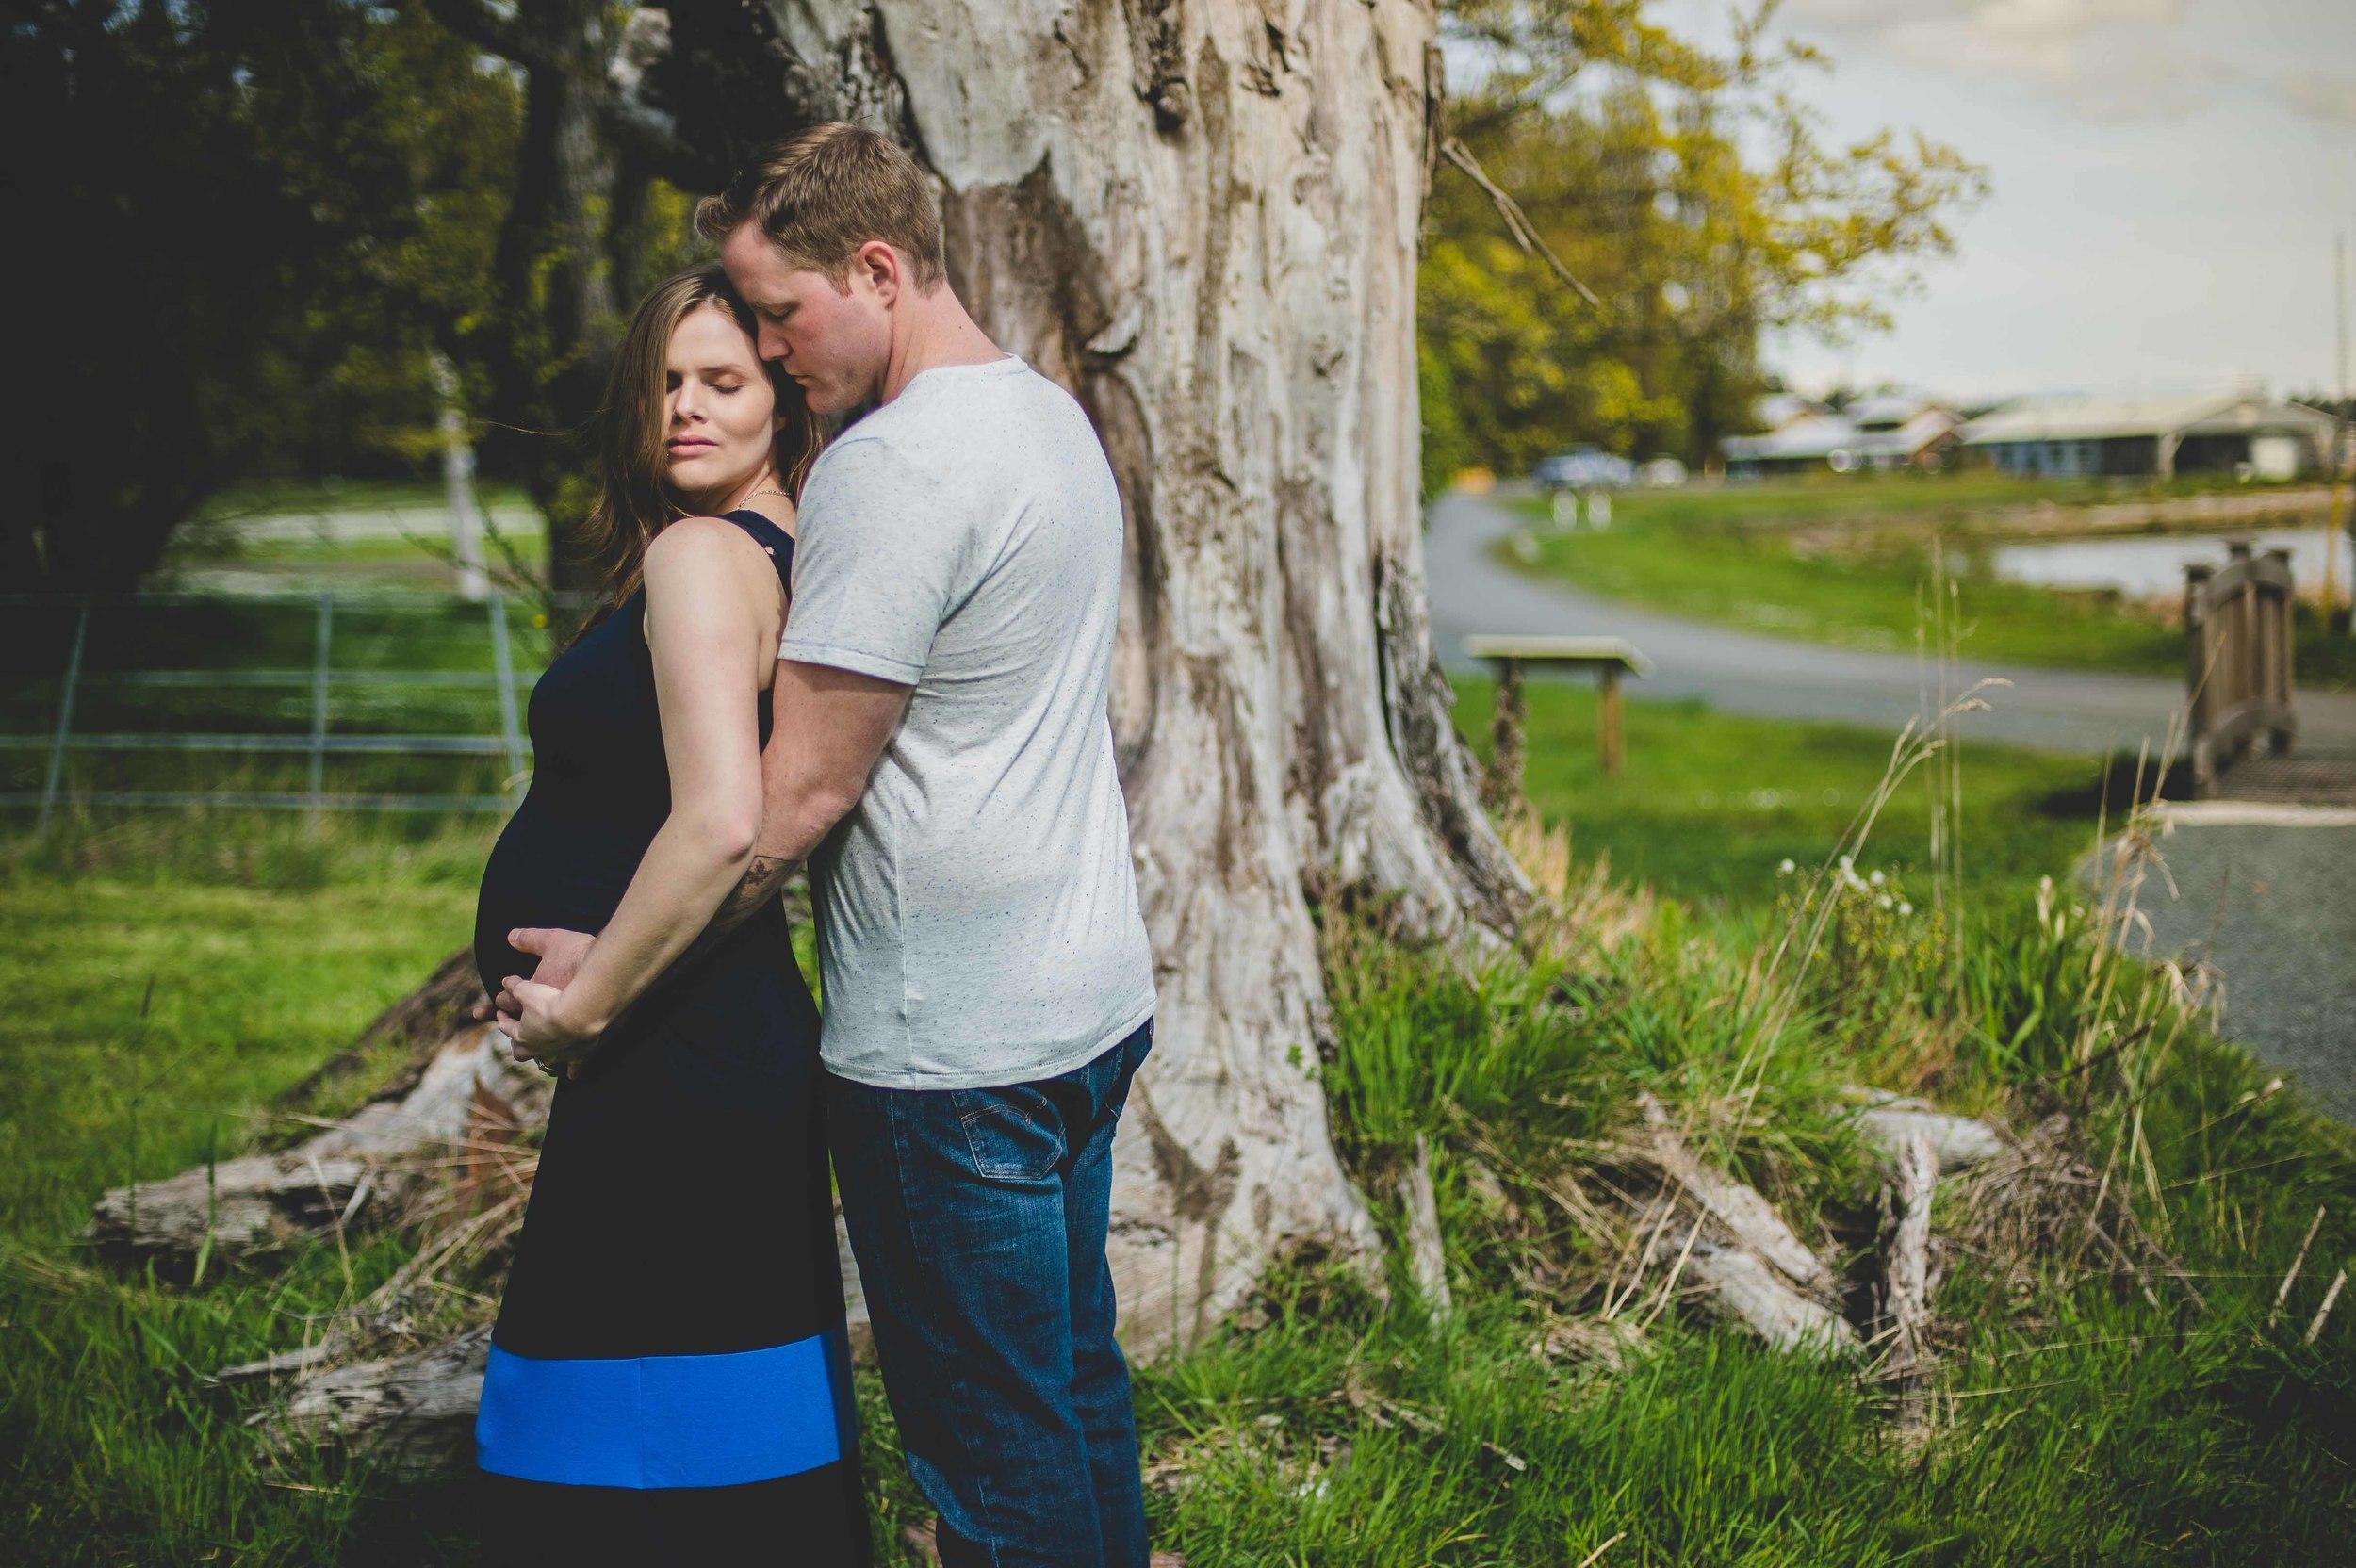 Victoria Royal Roads University Maternity photography edward lai